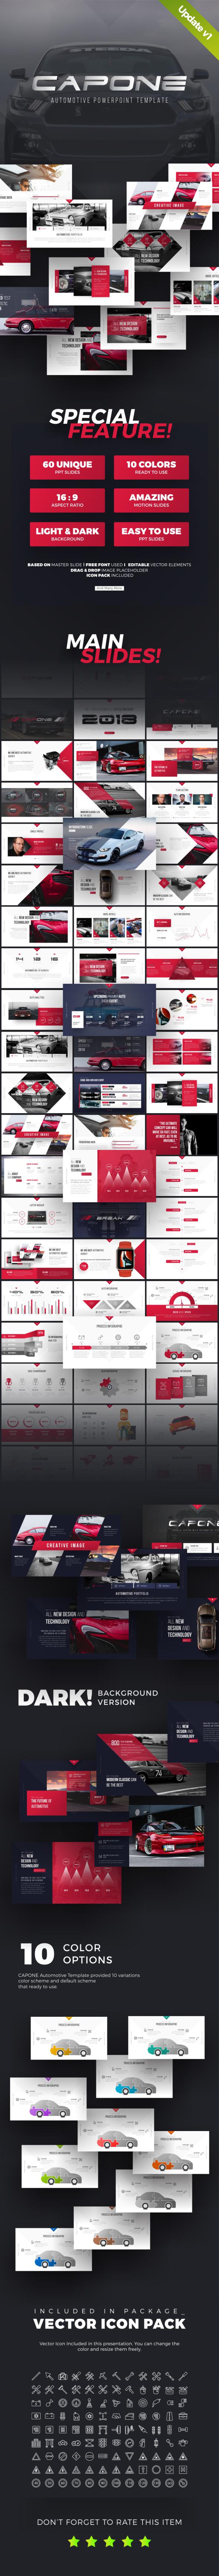 Capone Automotive Presentation Template - PowerPoint Templates Presentation Templates